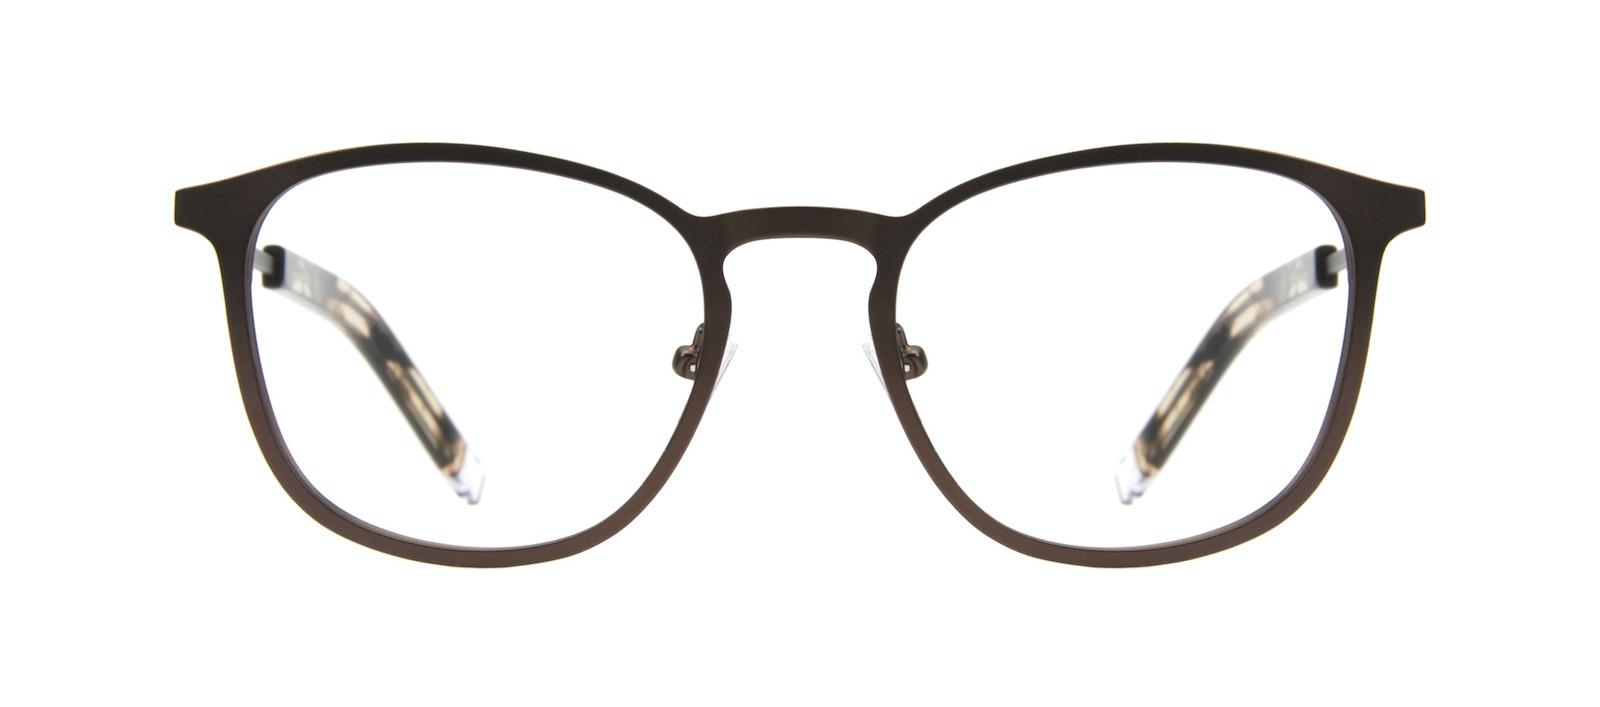 Affordable Fashion Glasses Rectangle Square Eyeglasses Men Core Mud Front